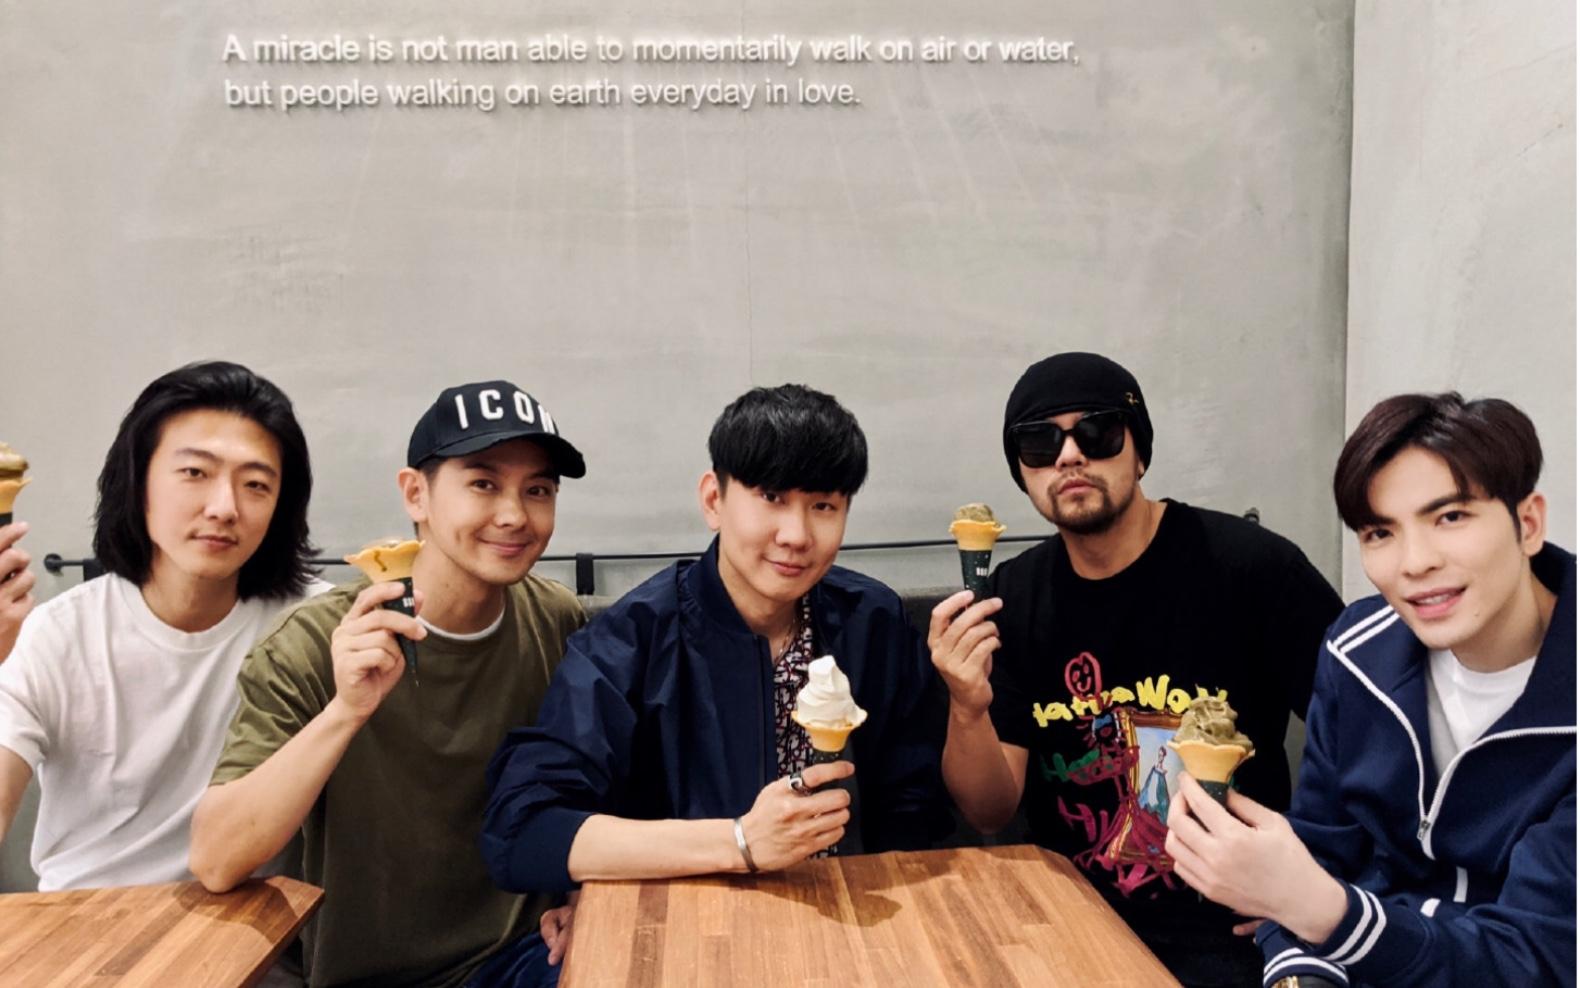 【JJ LIN林俊傑】快樂男人幫-奇跡般的聚會   Miracle Coffee×SMG臺北新店   2020.05.21_嗶哩嗶哩 (゜-゜)つロ 干杯~-bilibili